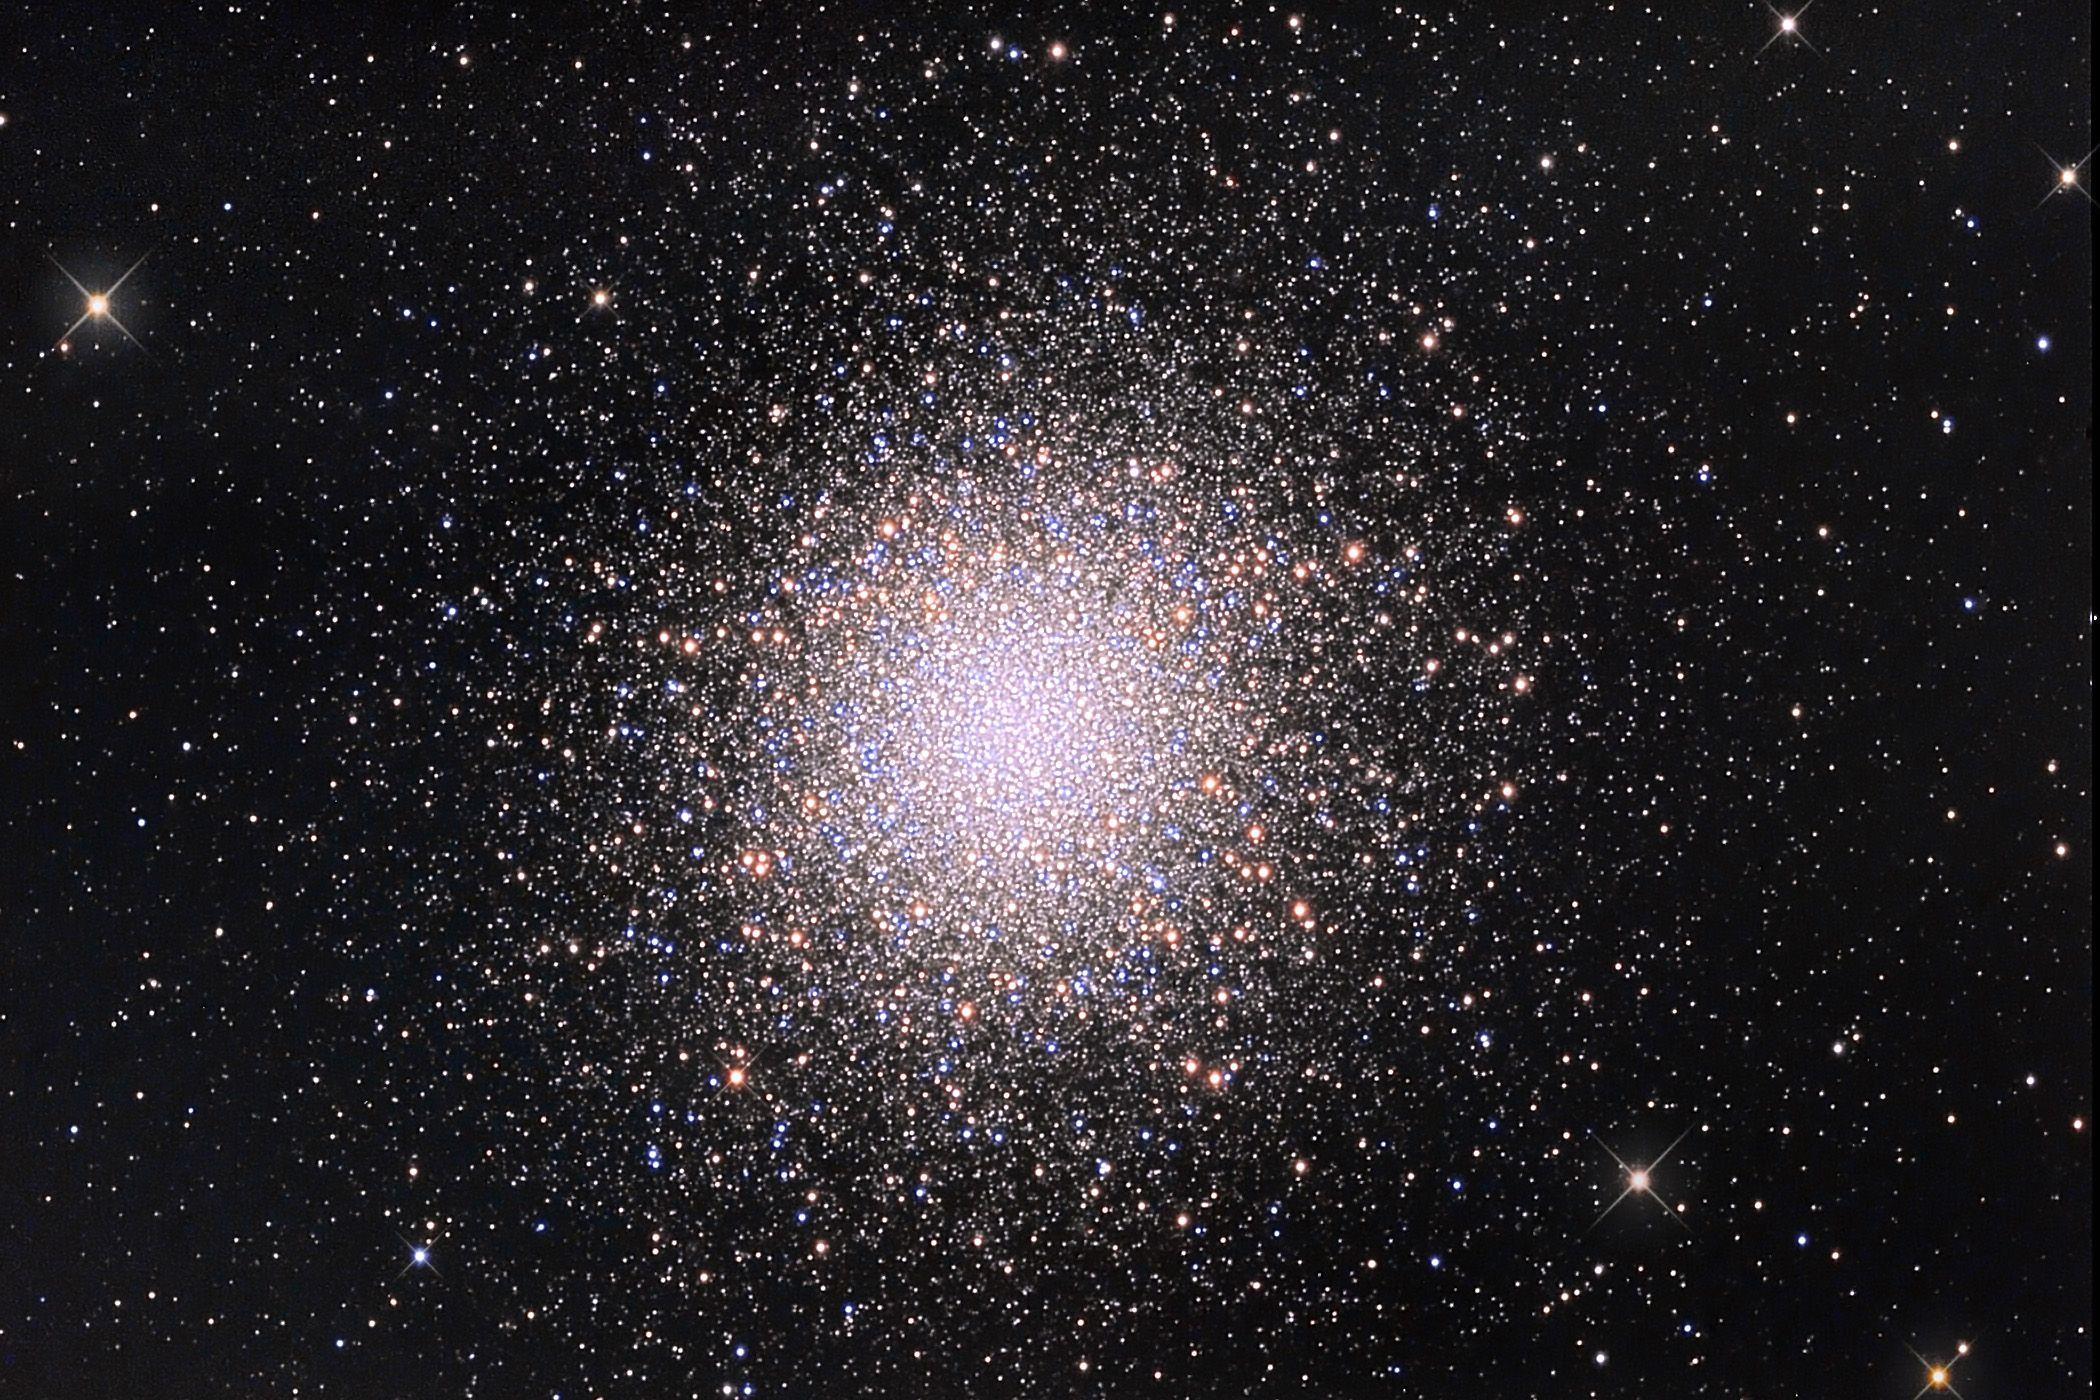 M13: The Great Globular Cluster in Hercules   Image Credit & Copyright: Marco Burali, Tiziano Capecchi, Marco Mancini (Osservatorio MTM)